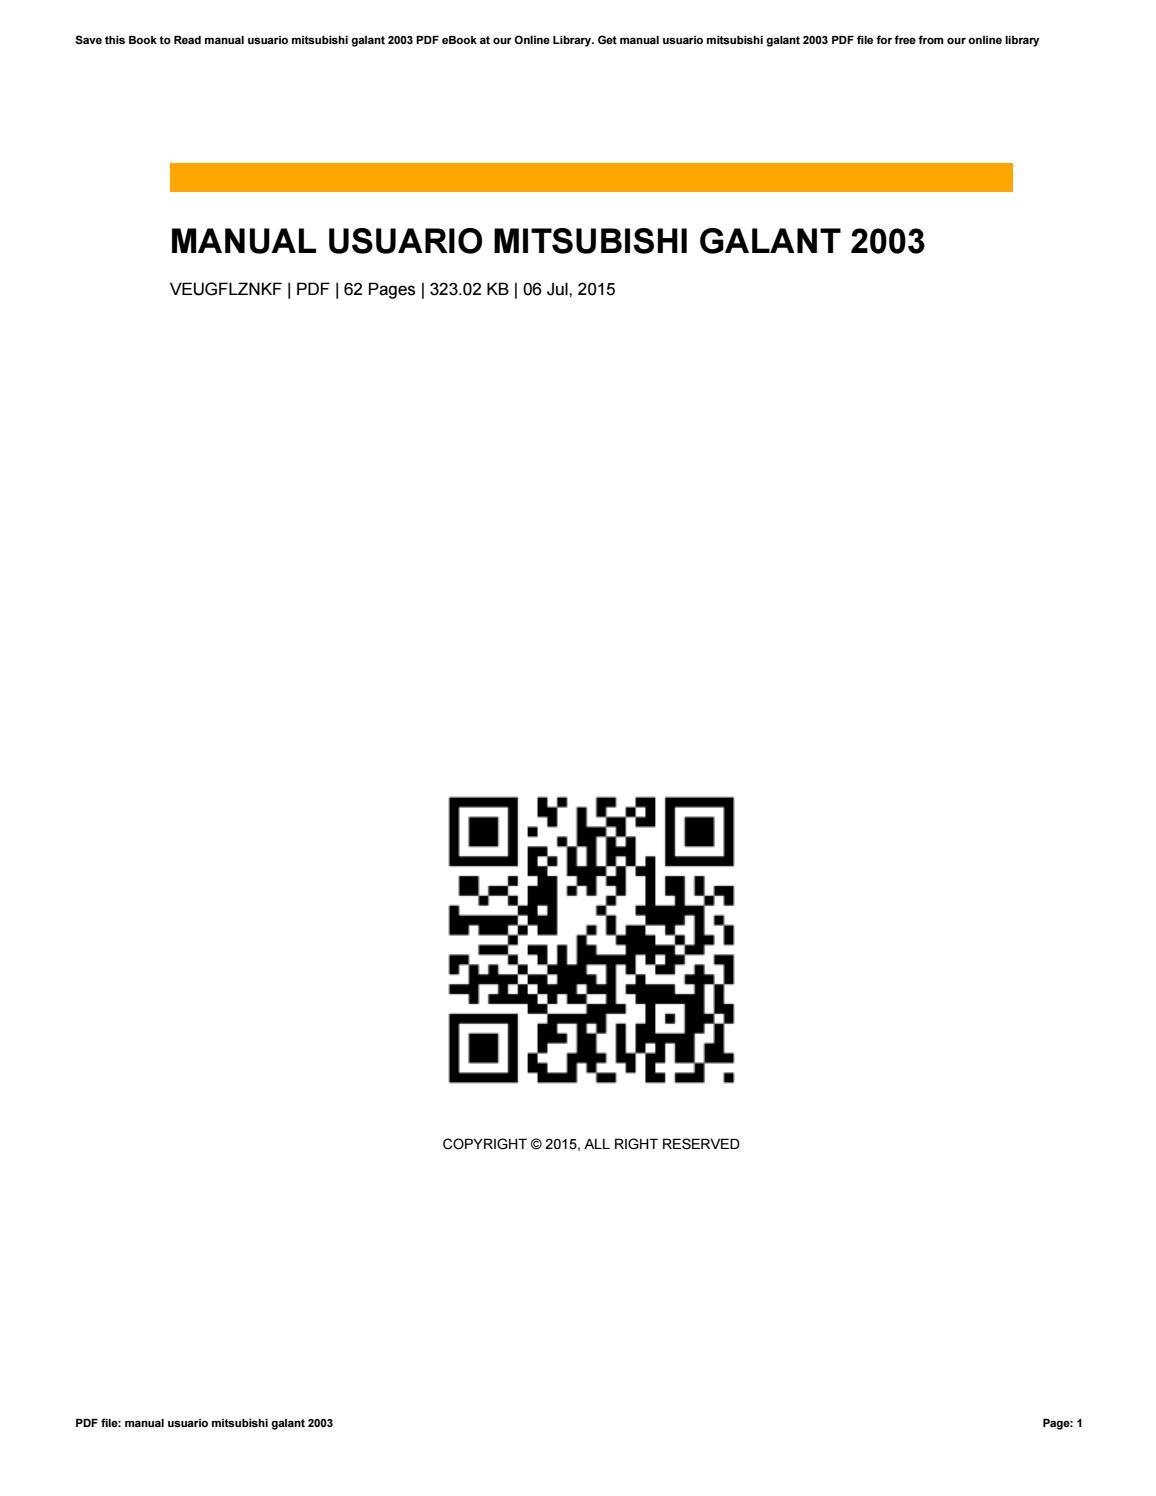 Manual usuario mitsubishi galant 2003 by fatikah71rahmah issuu fandeluxe Gallery